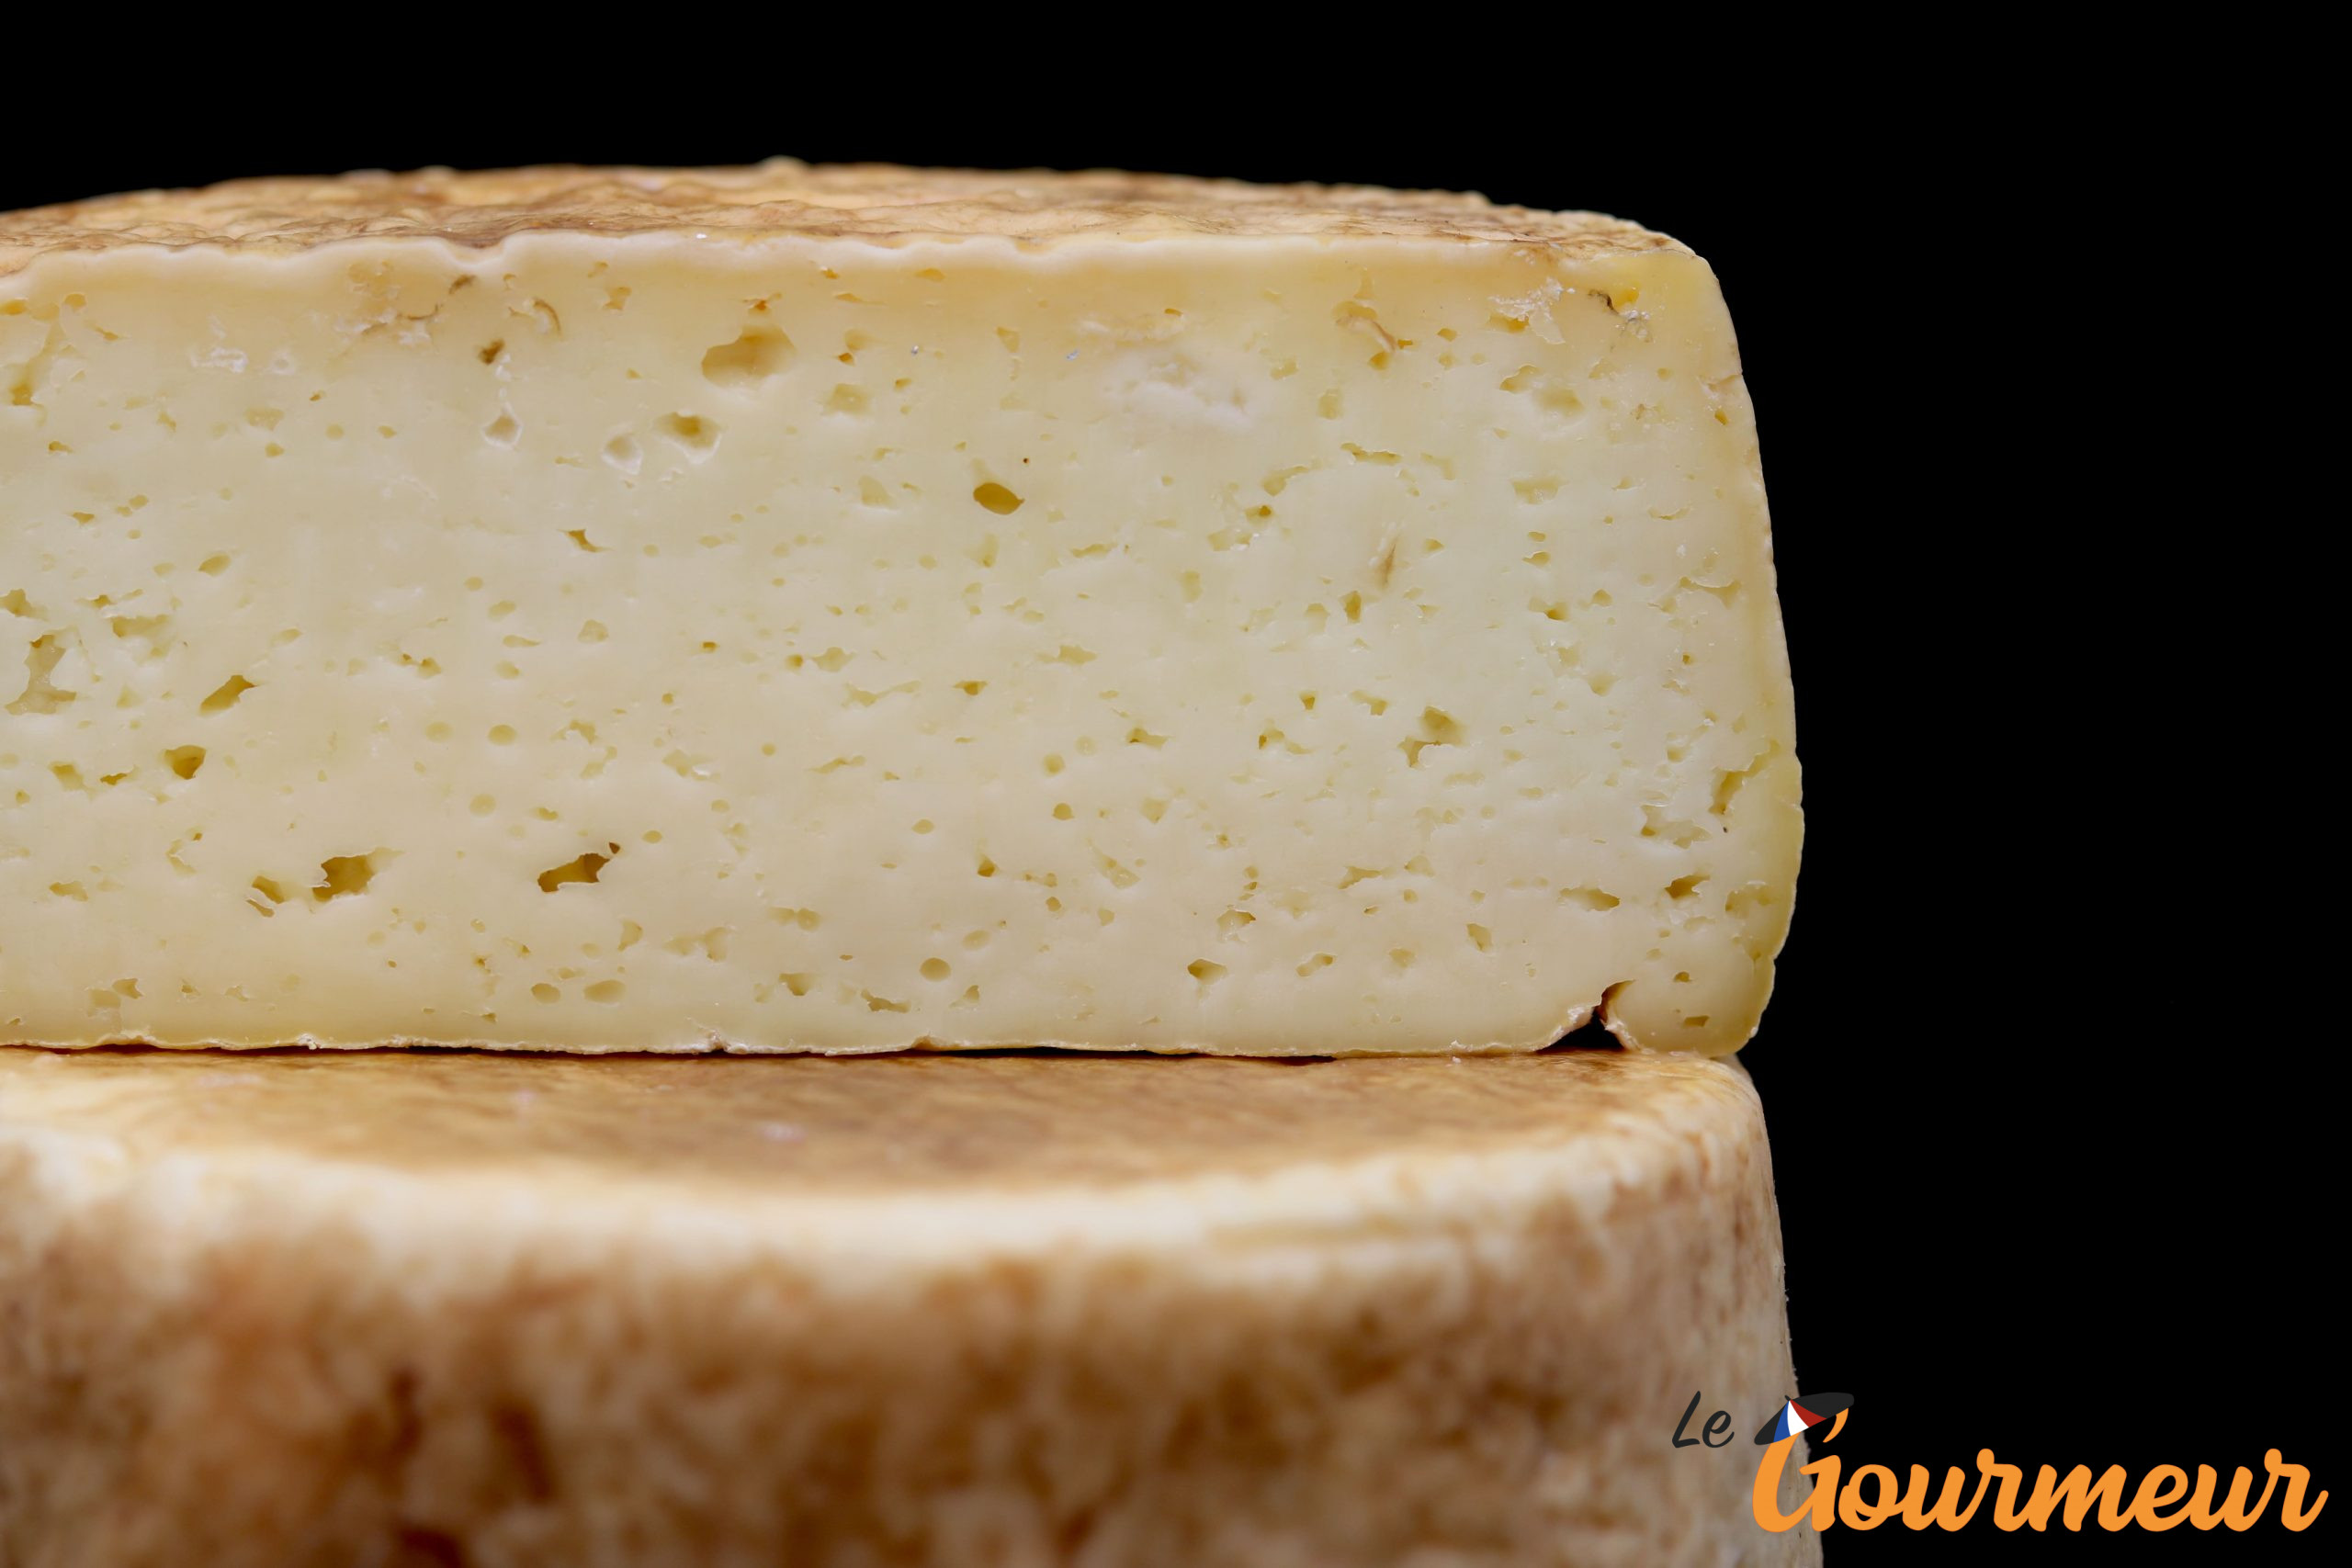 galet de bain de bretagne fromage bretagne